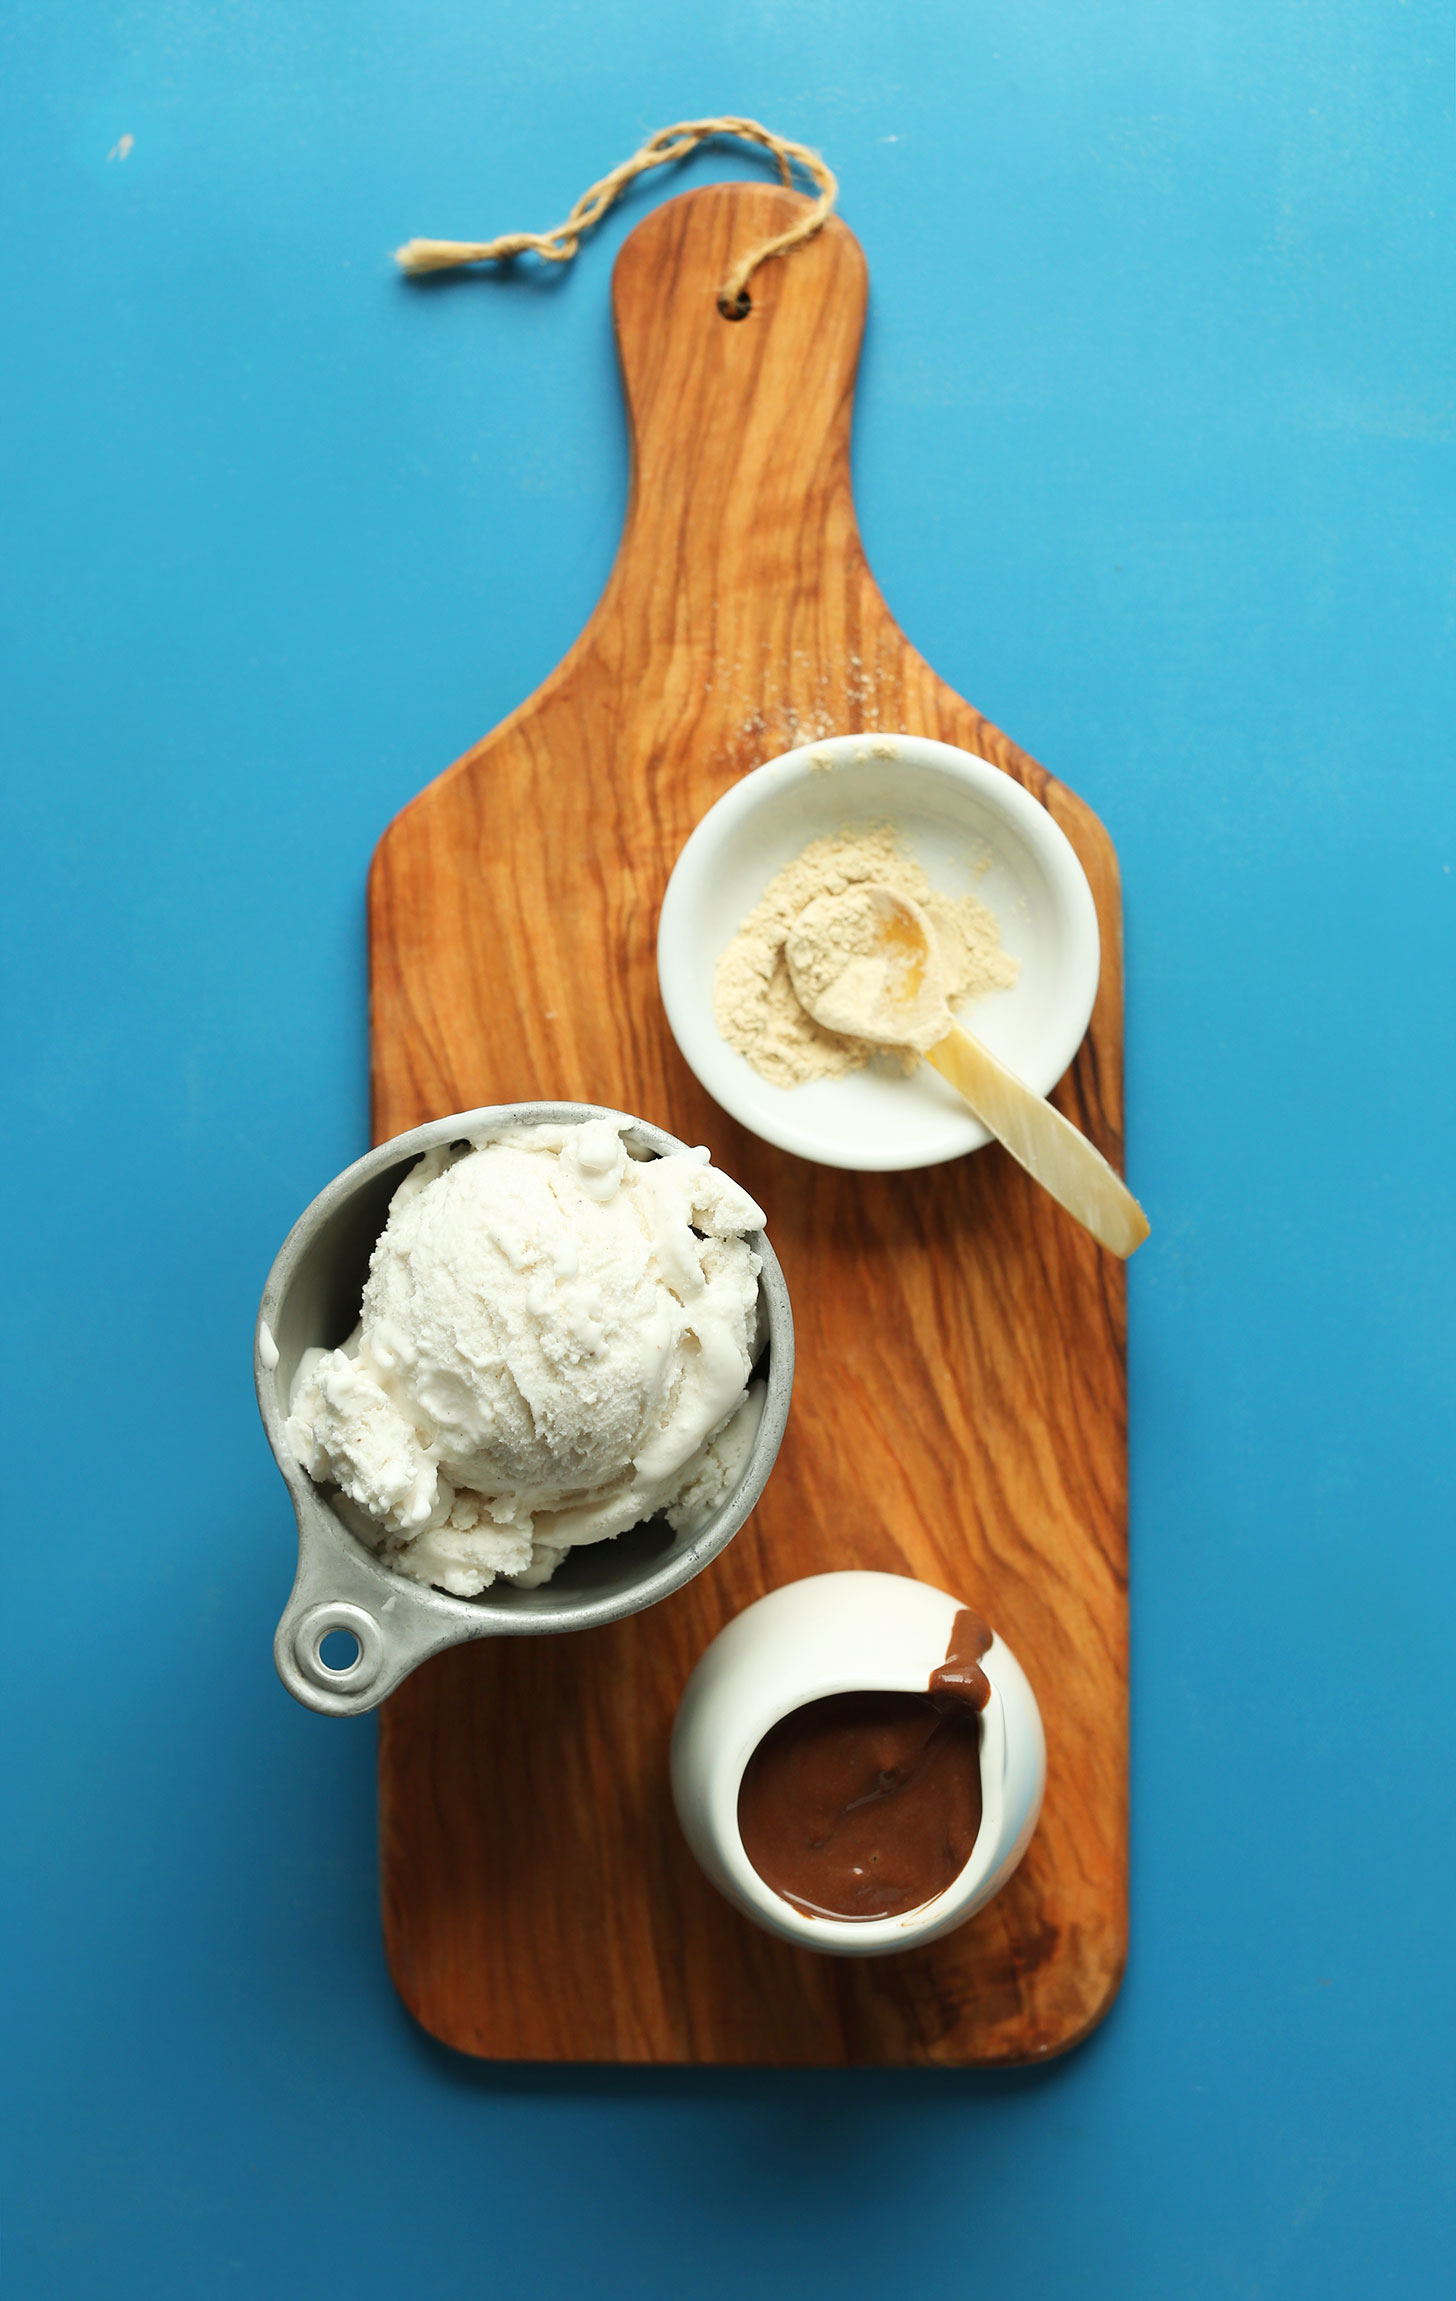 Wood cutting board with maca, vegan ice cream, and chocolate sauce for making a Chocolate Vegan Malt